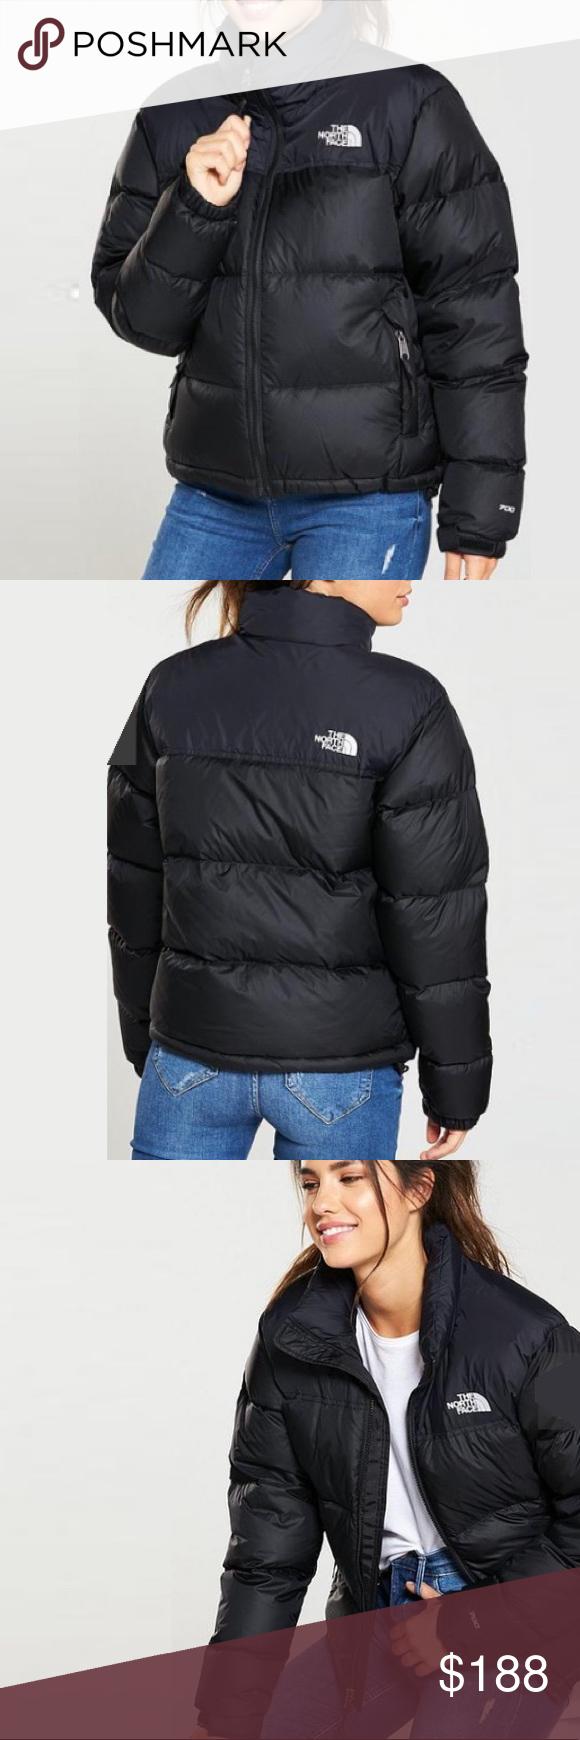 North Face 1996 Nuptse Retro Down 700 Jacket Coat Jackets Clothes Design The North Face [ 1740 x 580 Pixel ]